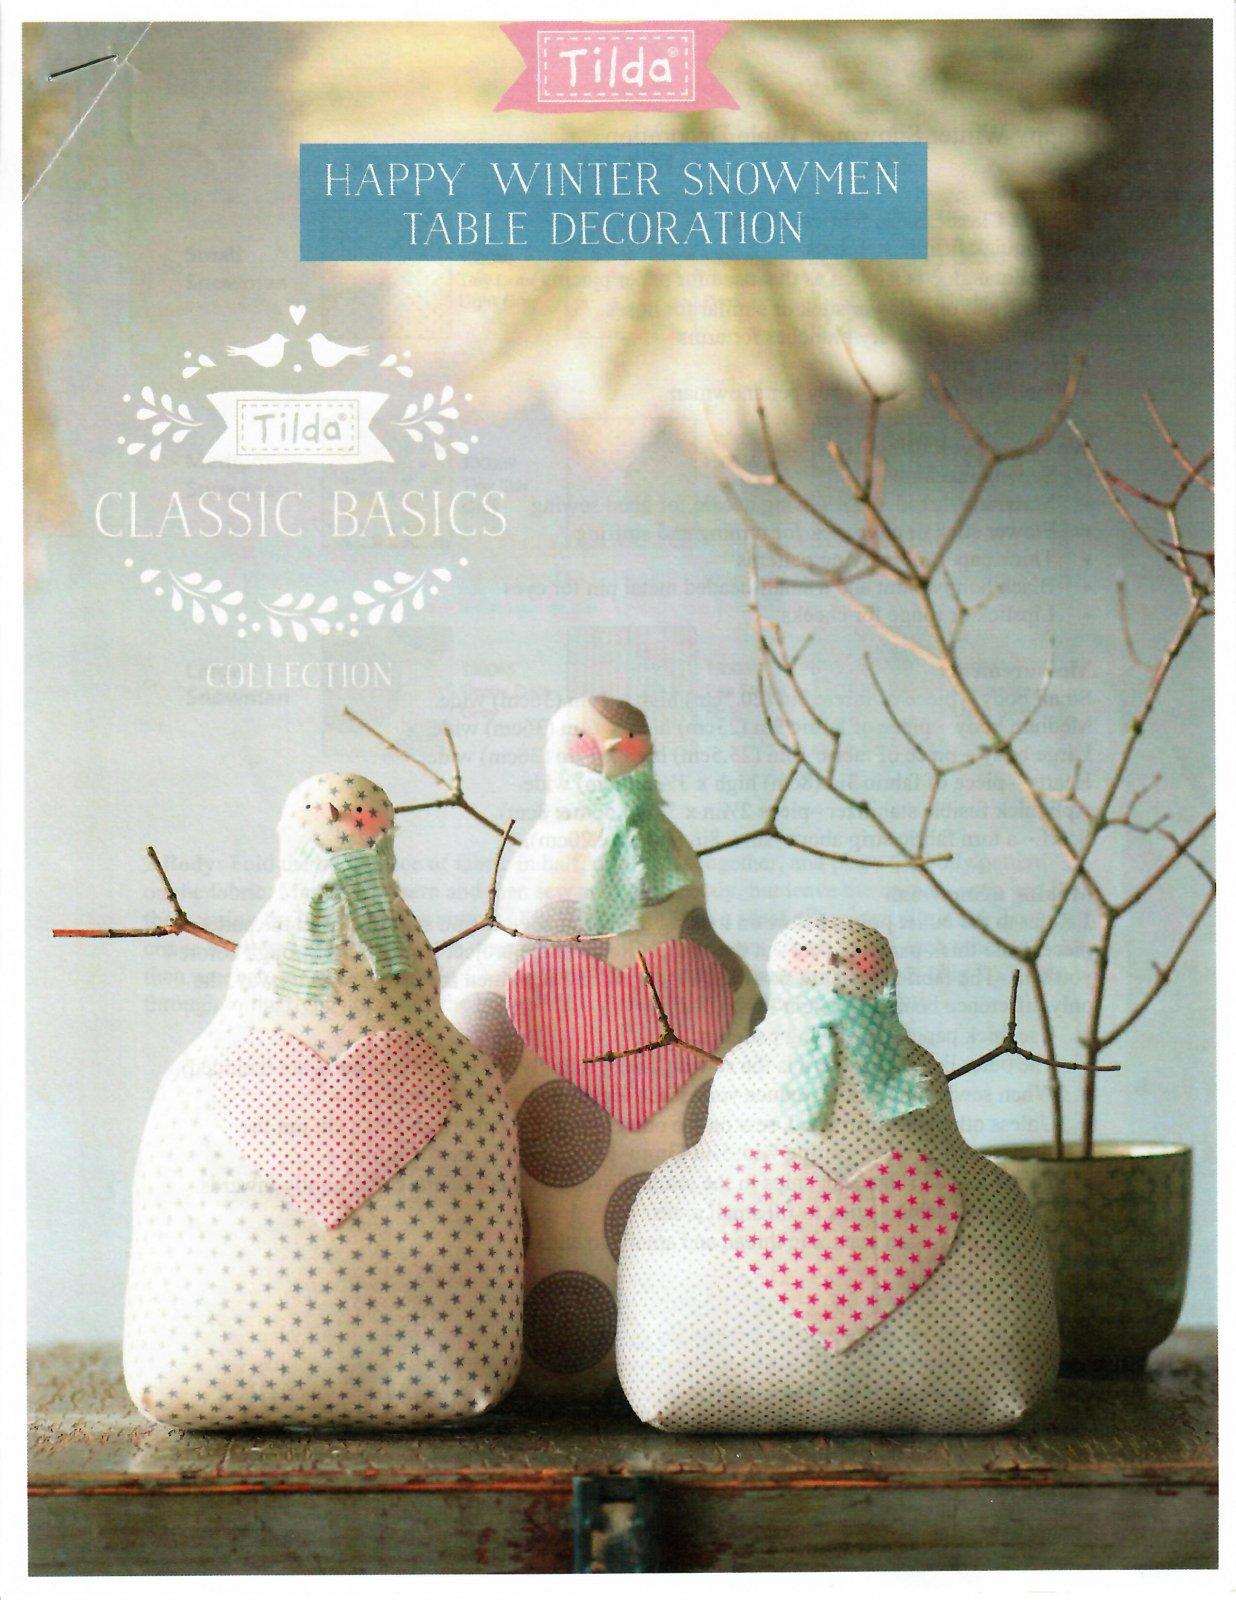 Happy Winter Snowman Table Decoration Kit